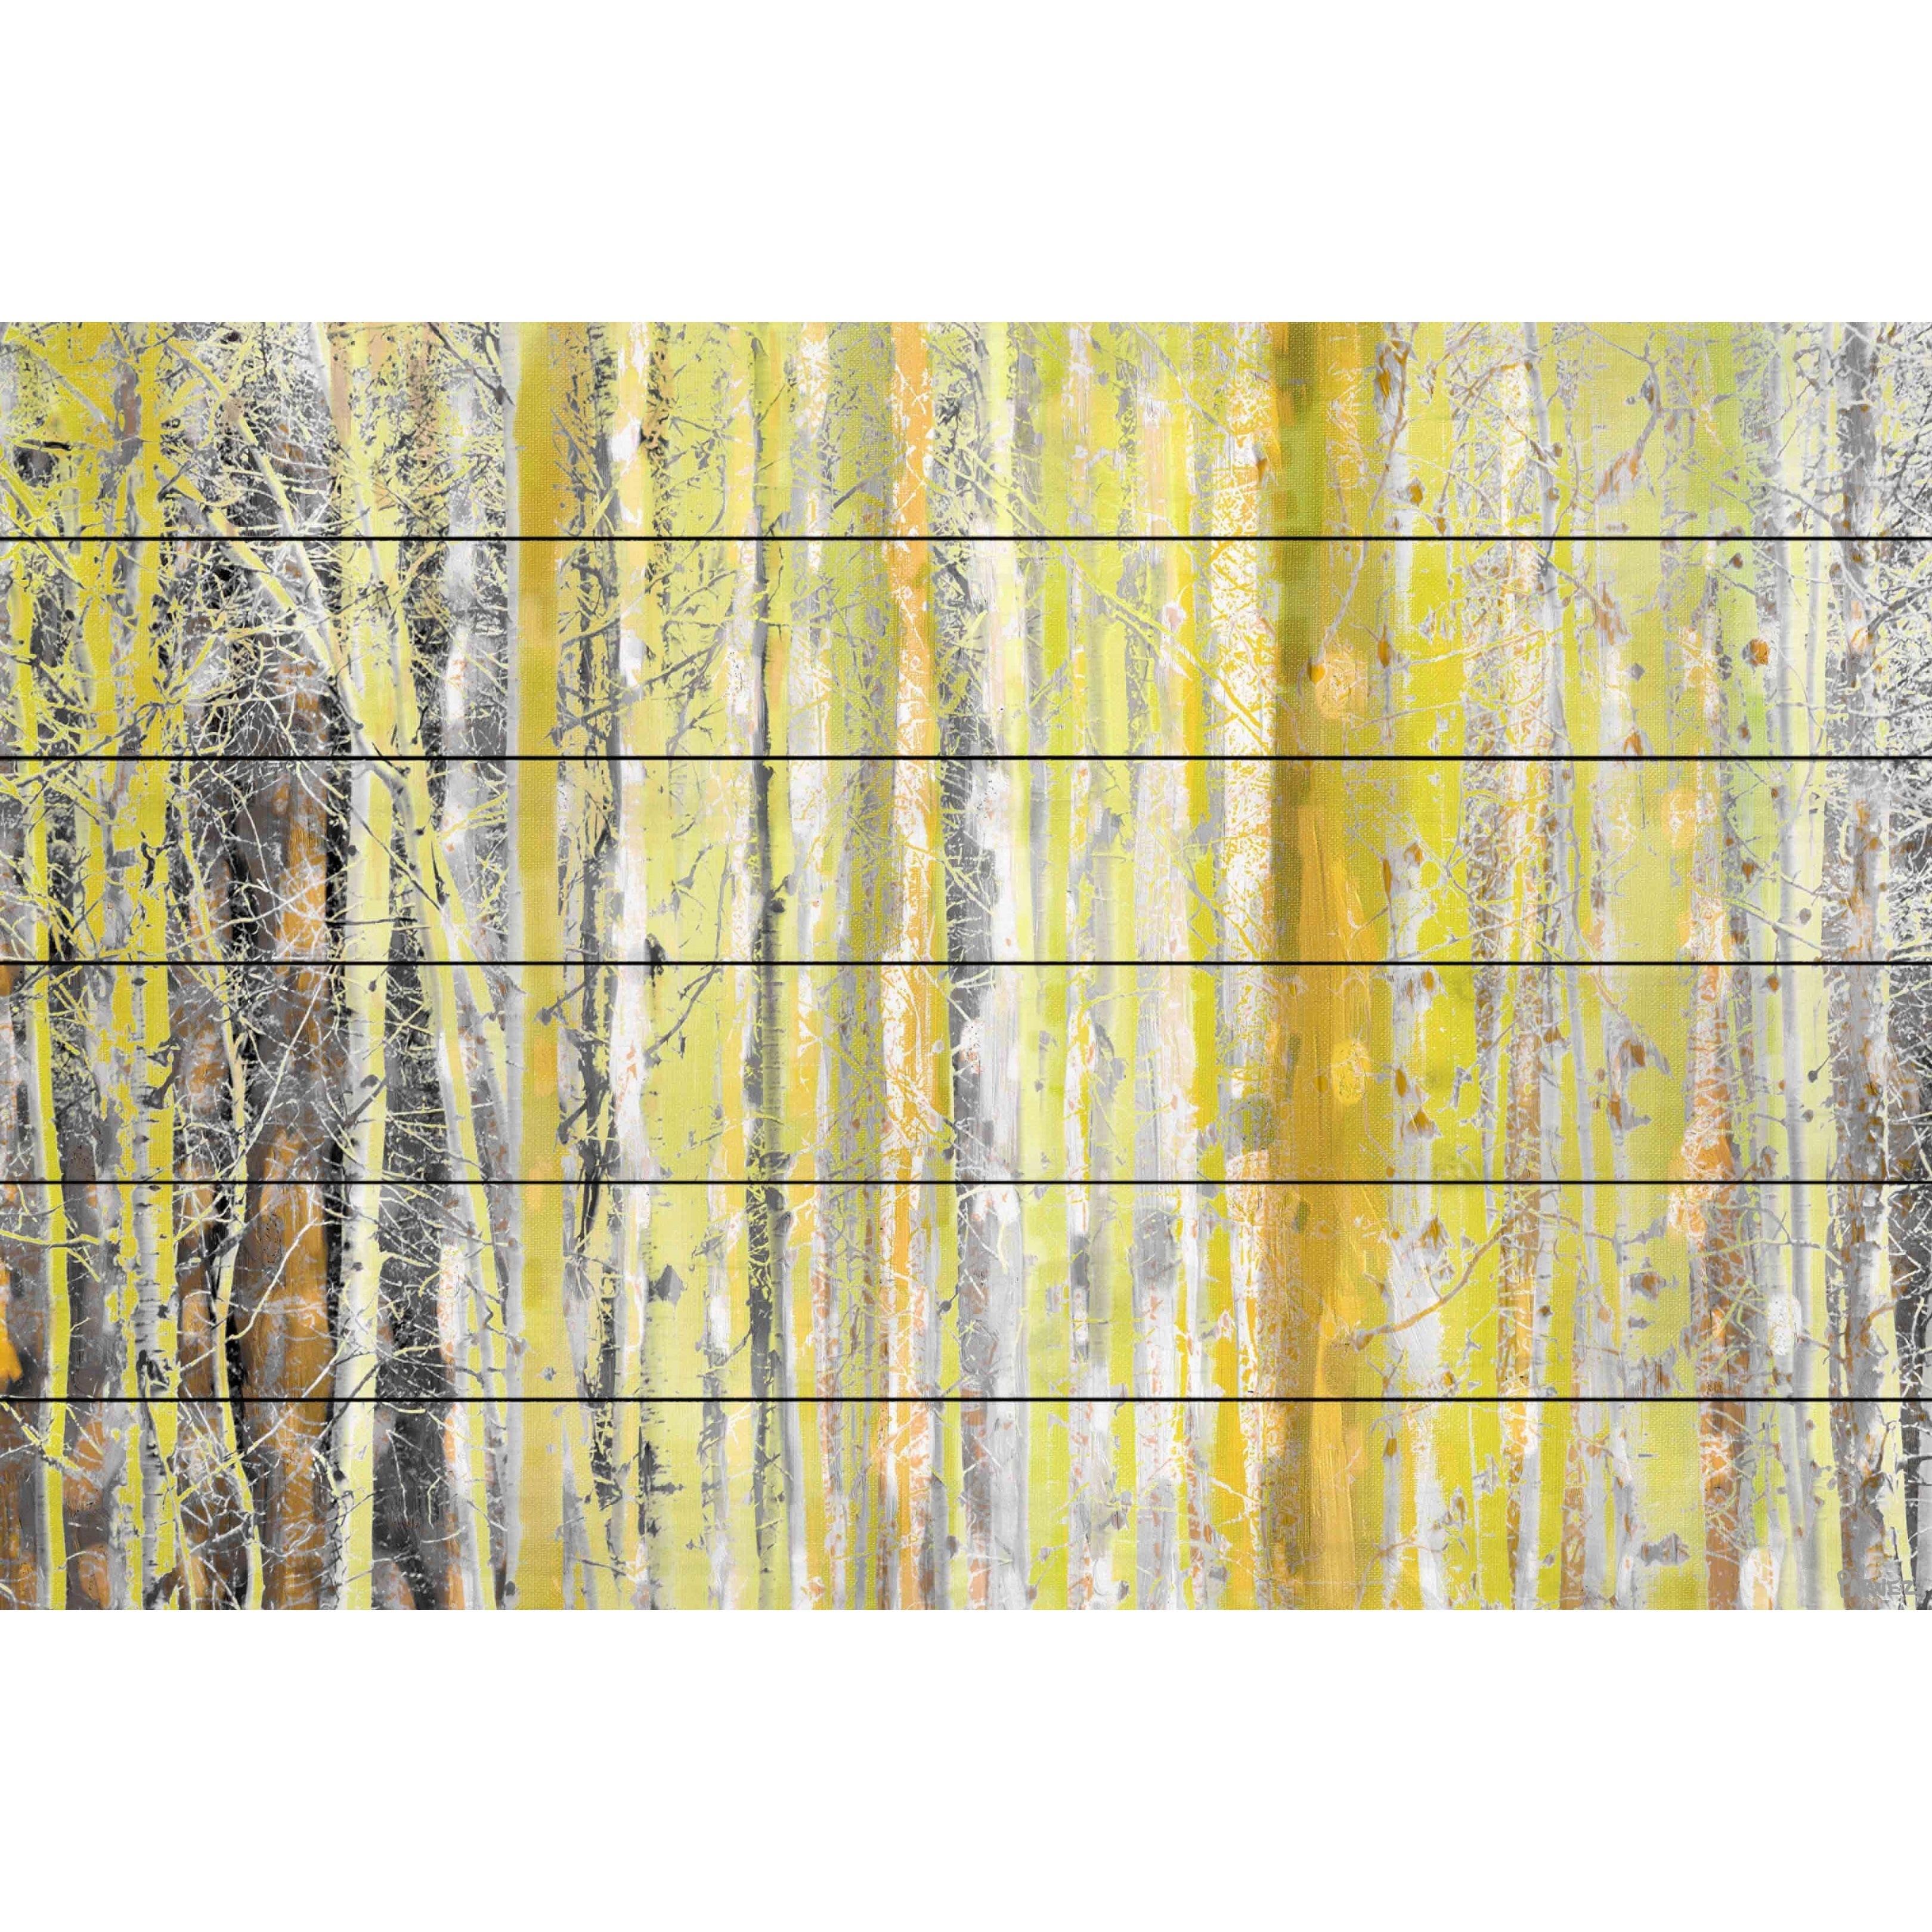 Shop Parvez Taj \'Aspen Forest 2\' Painting Print on White Wood - On ...